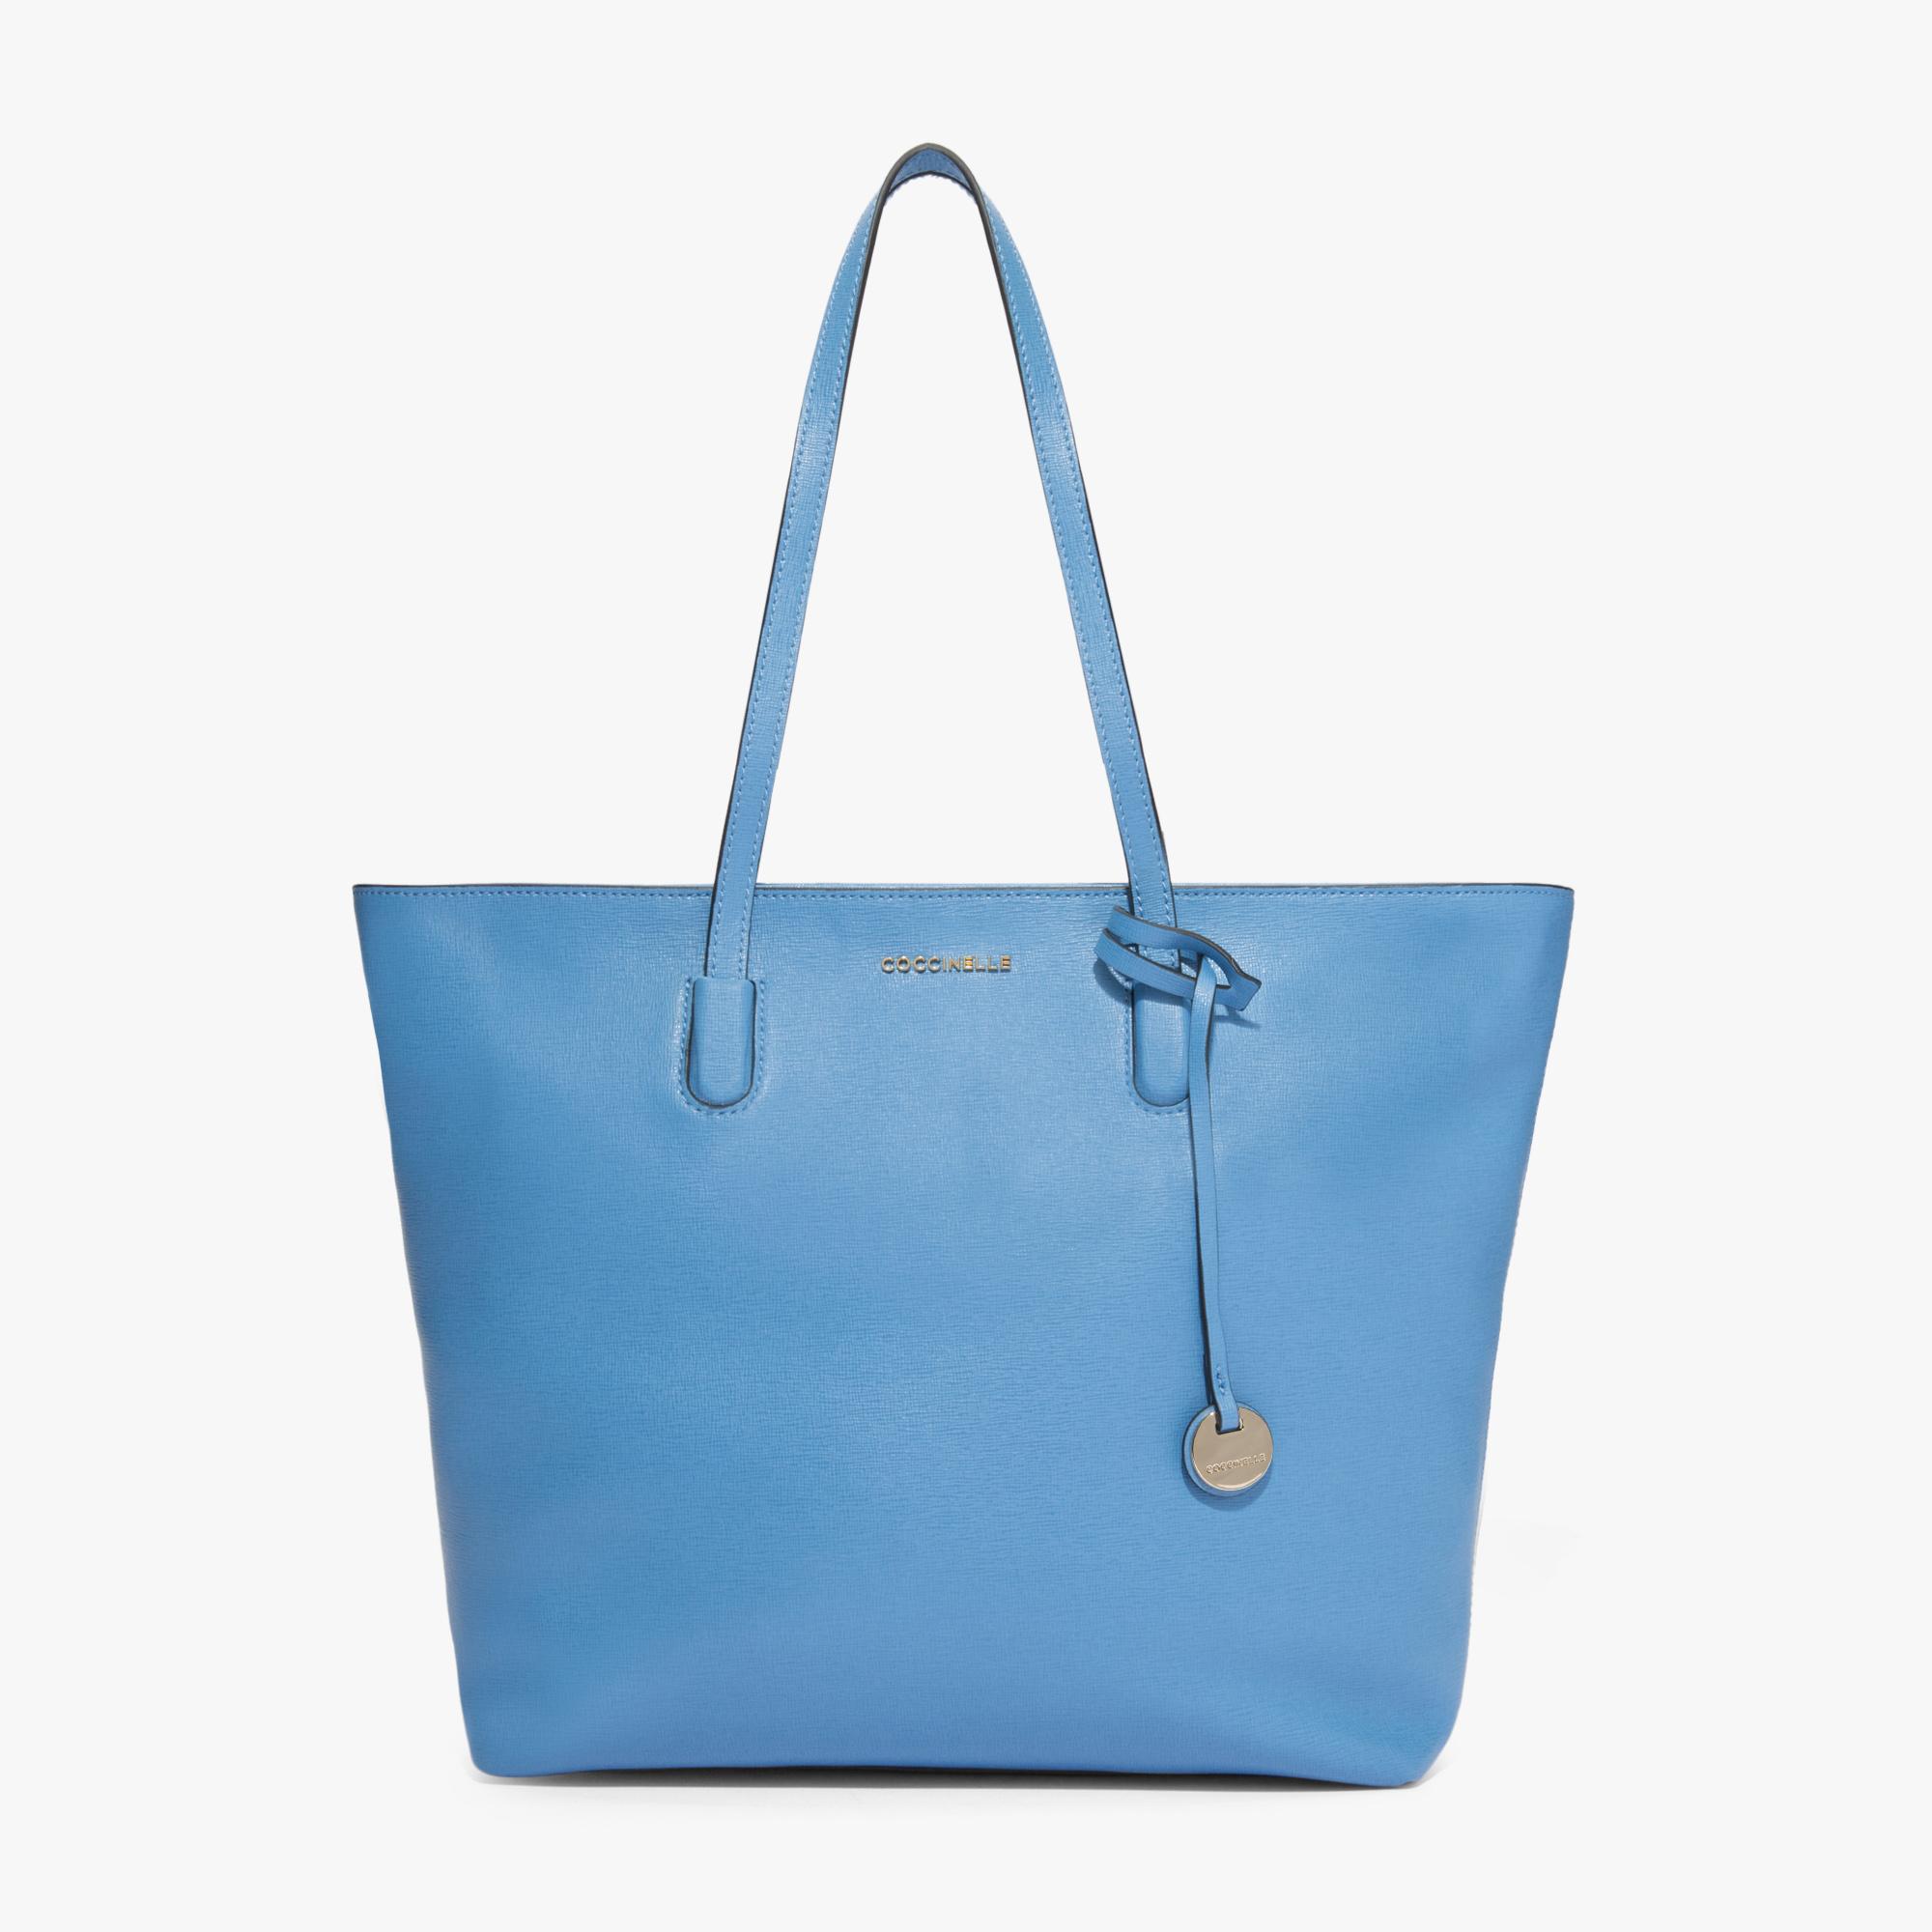 Clementine borsa shopping in saffiano